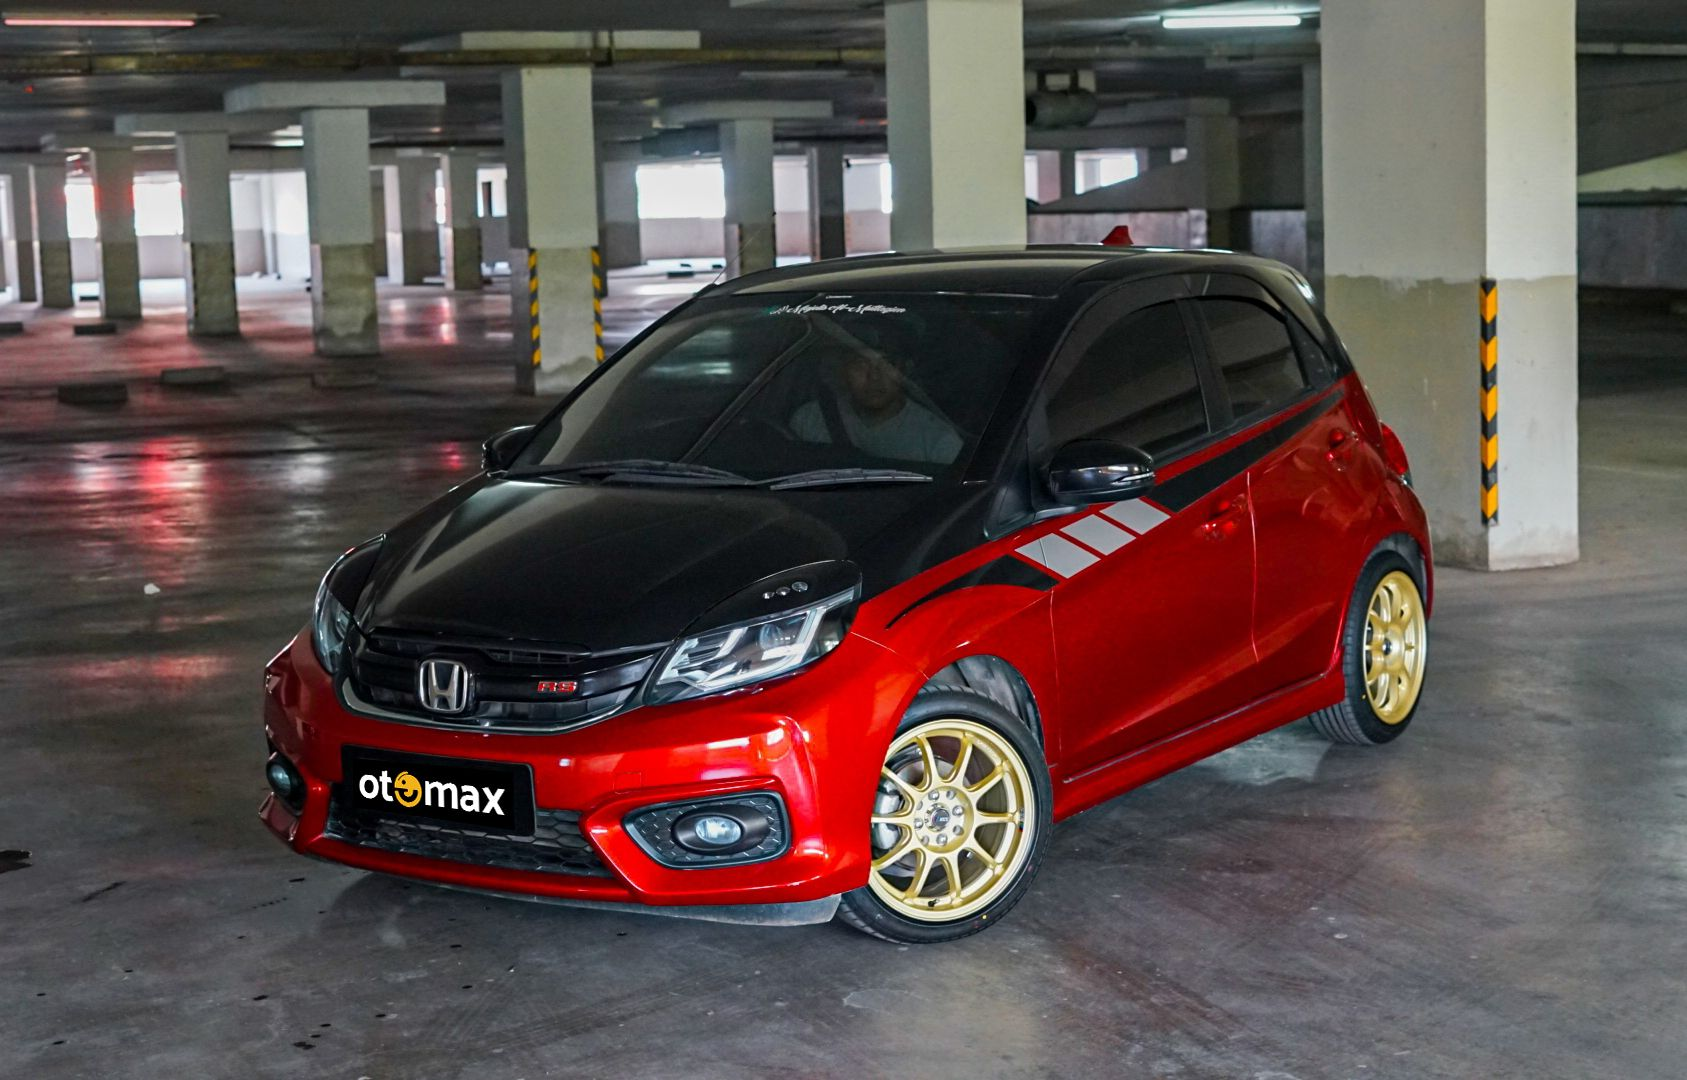 Modifikasi Mobil Honda Brio Pakai Velg Ssr Ring 16 Jadi Makin Ganteng Modifikasi Mobil Velg Honda